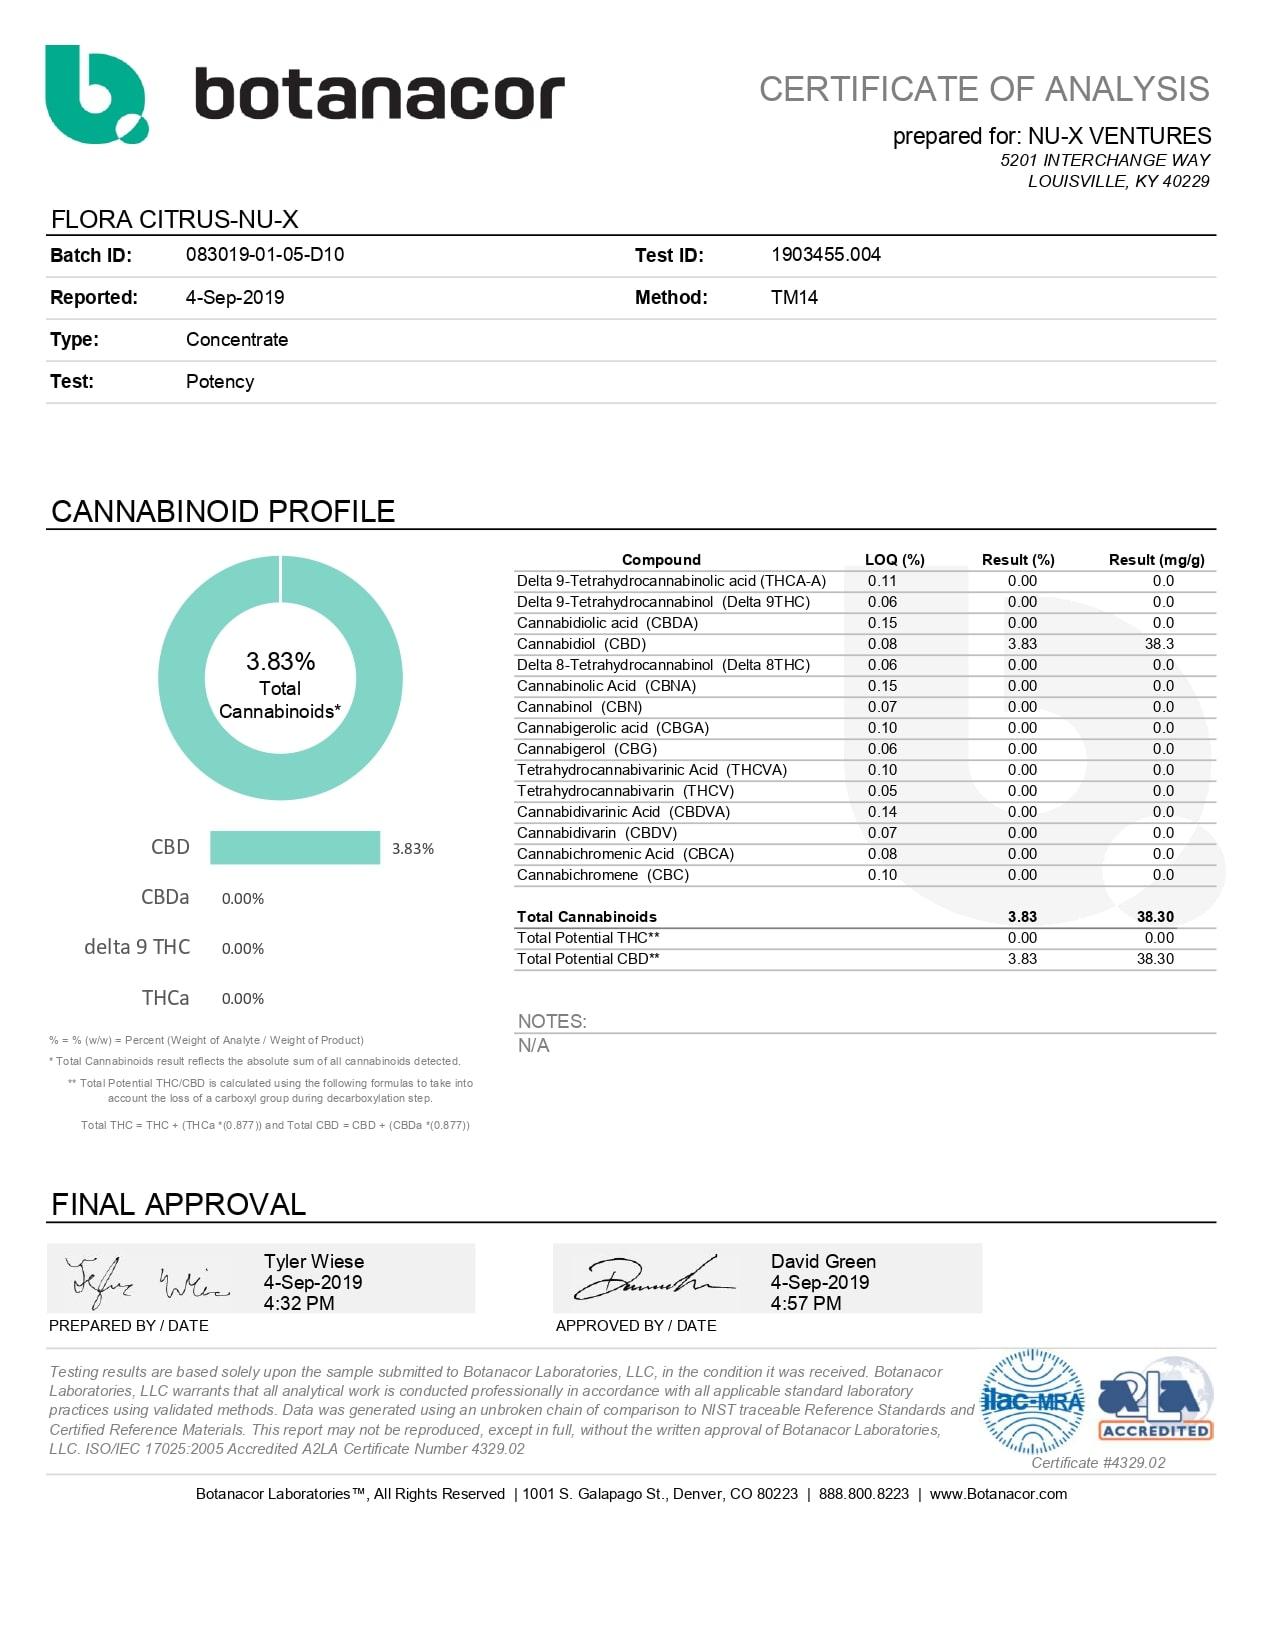 NU-X CBD Tincture Lab Report Flora Citrus 1000mg